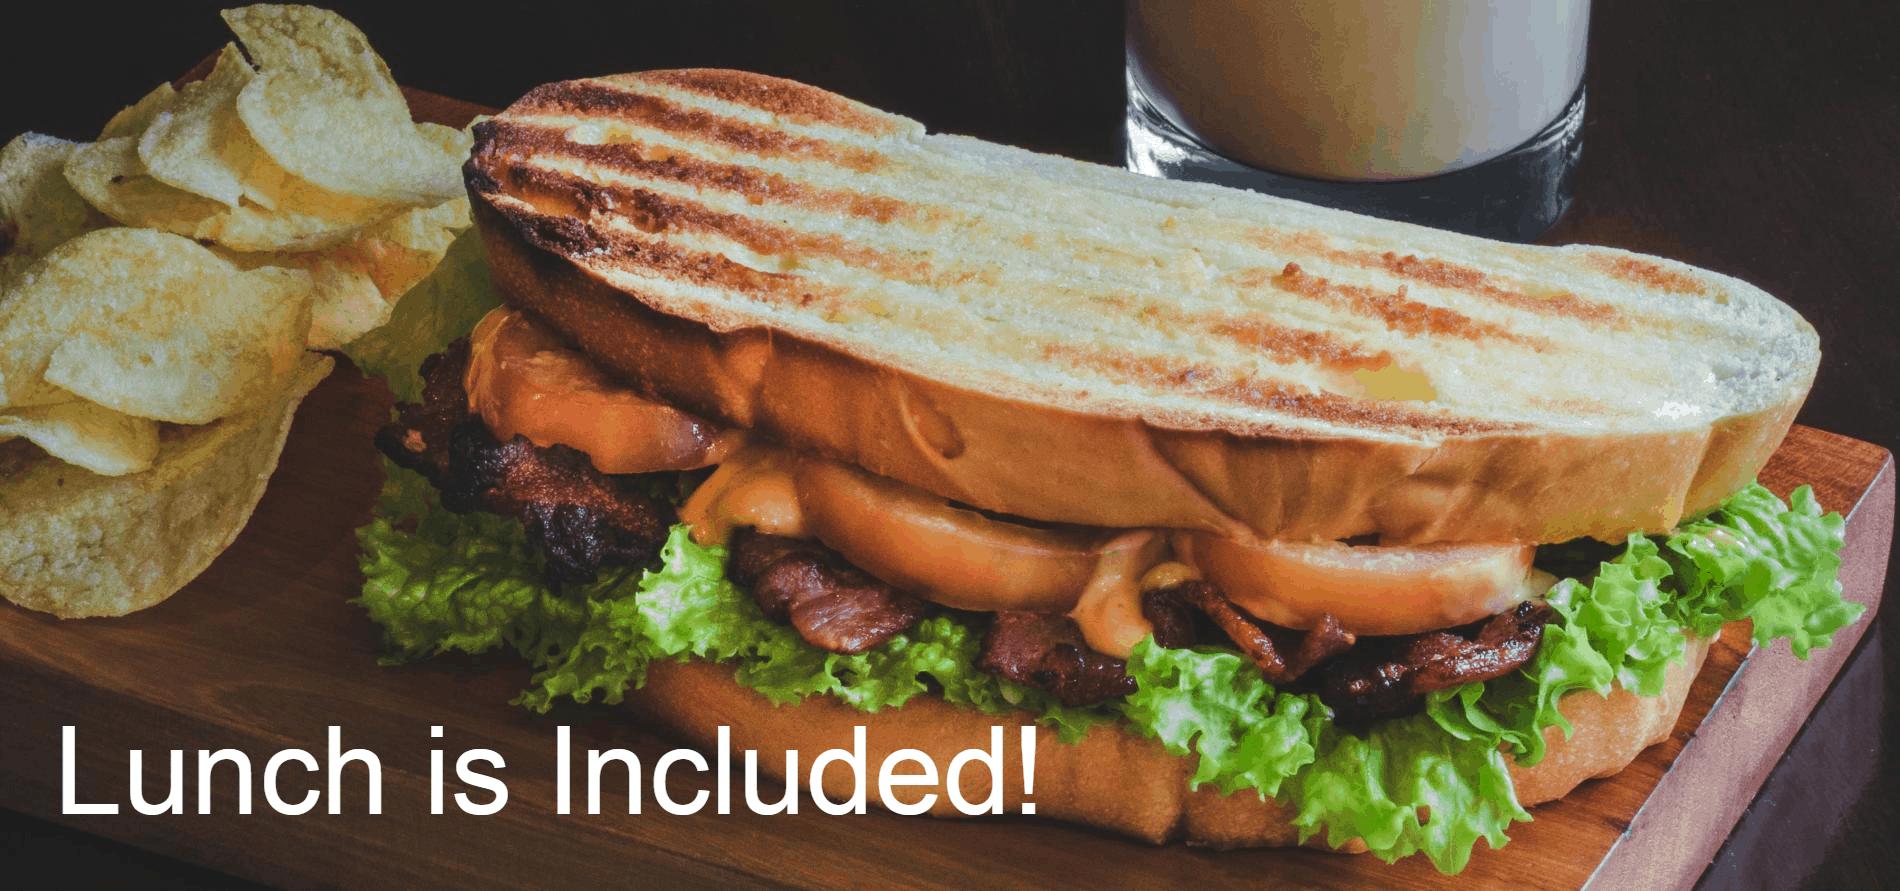 Sandwich 2 1900x850 Final